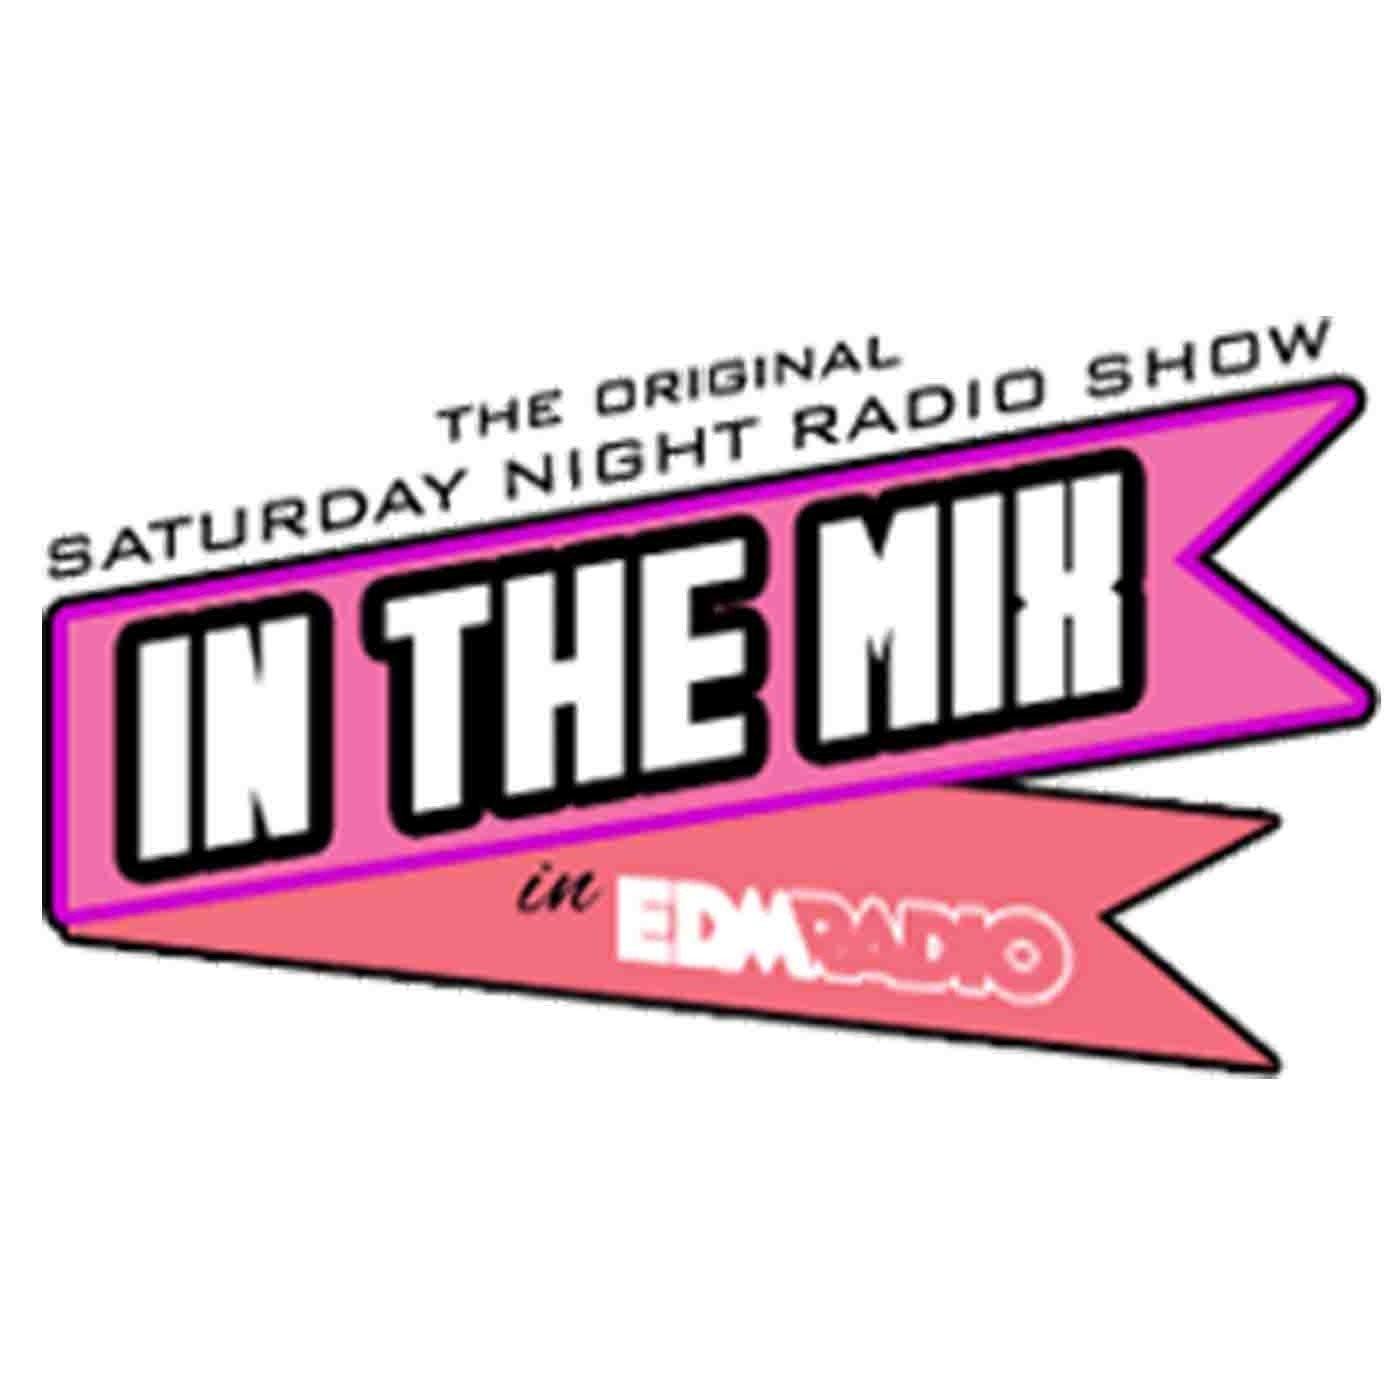 <![CDATA[In The Mix (EDM RADIO) ]]>